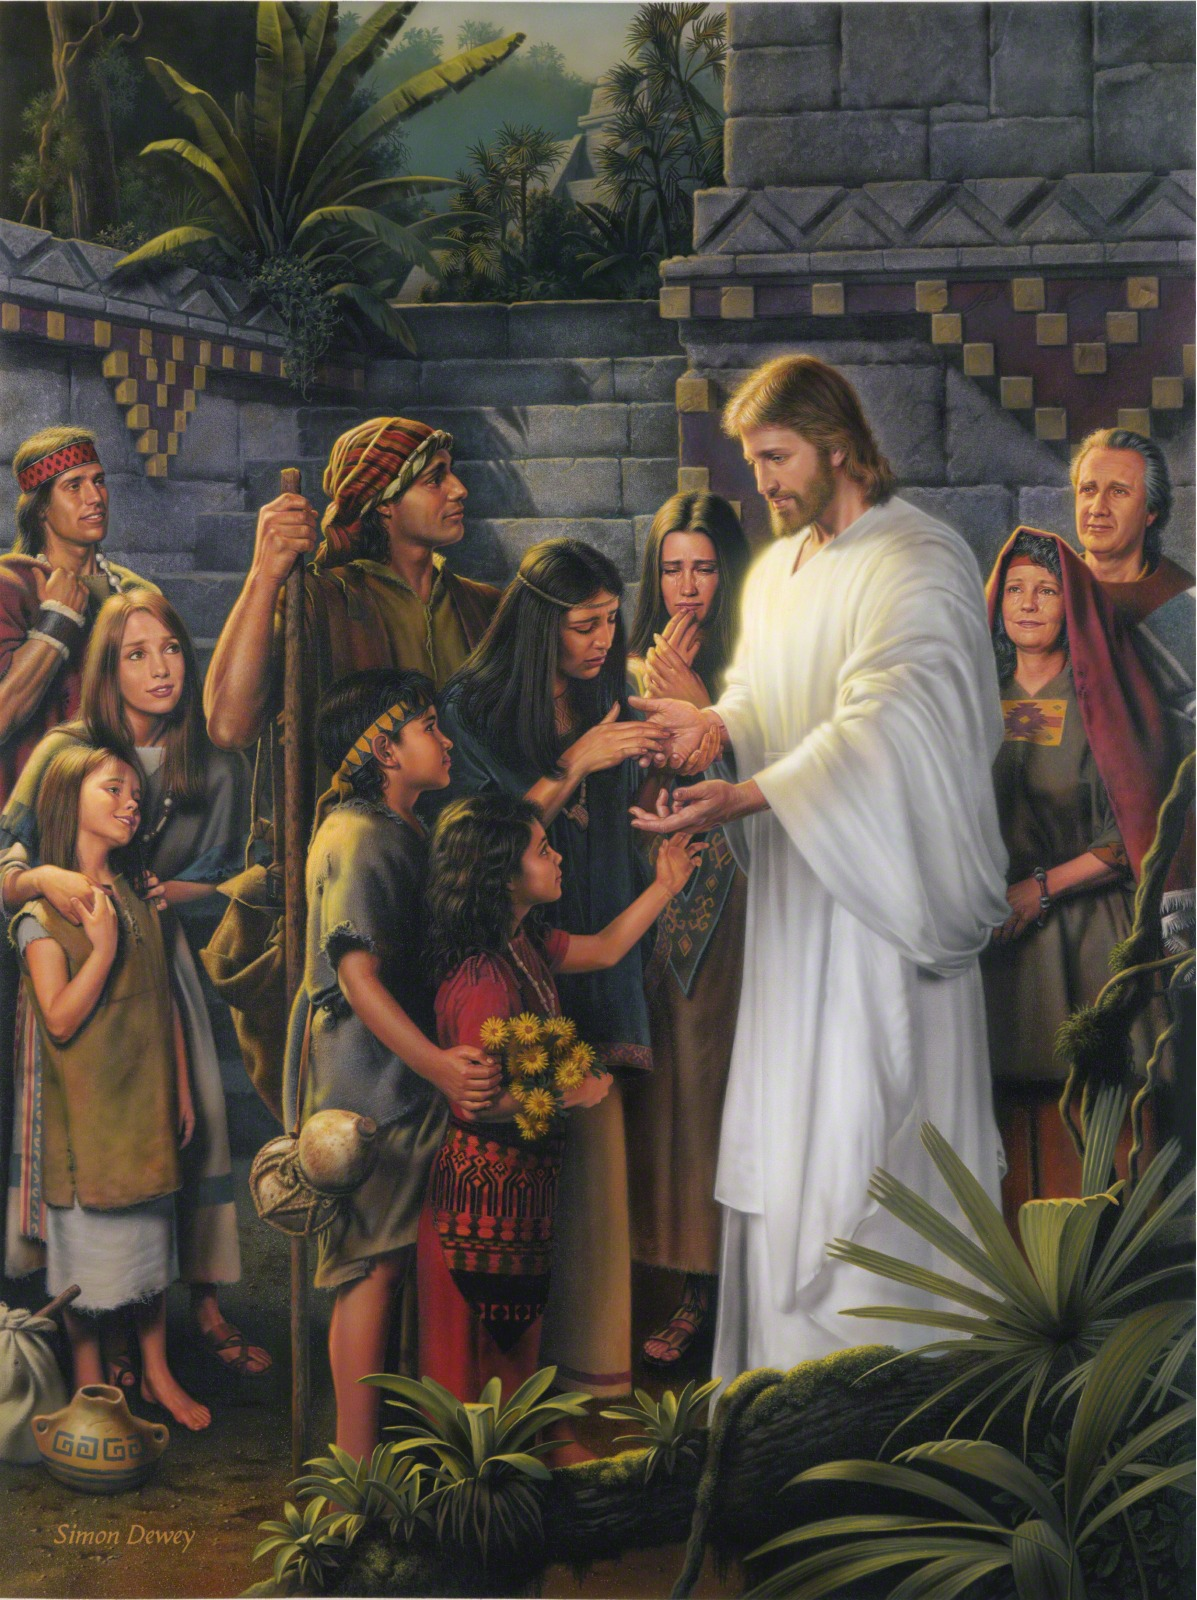 nativity jesus christ lds wallpaper - photo #26